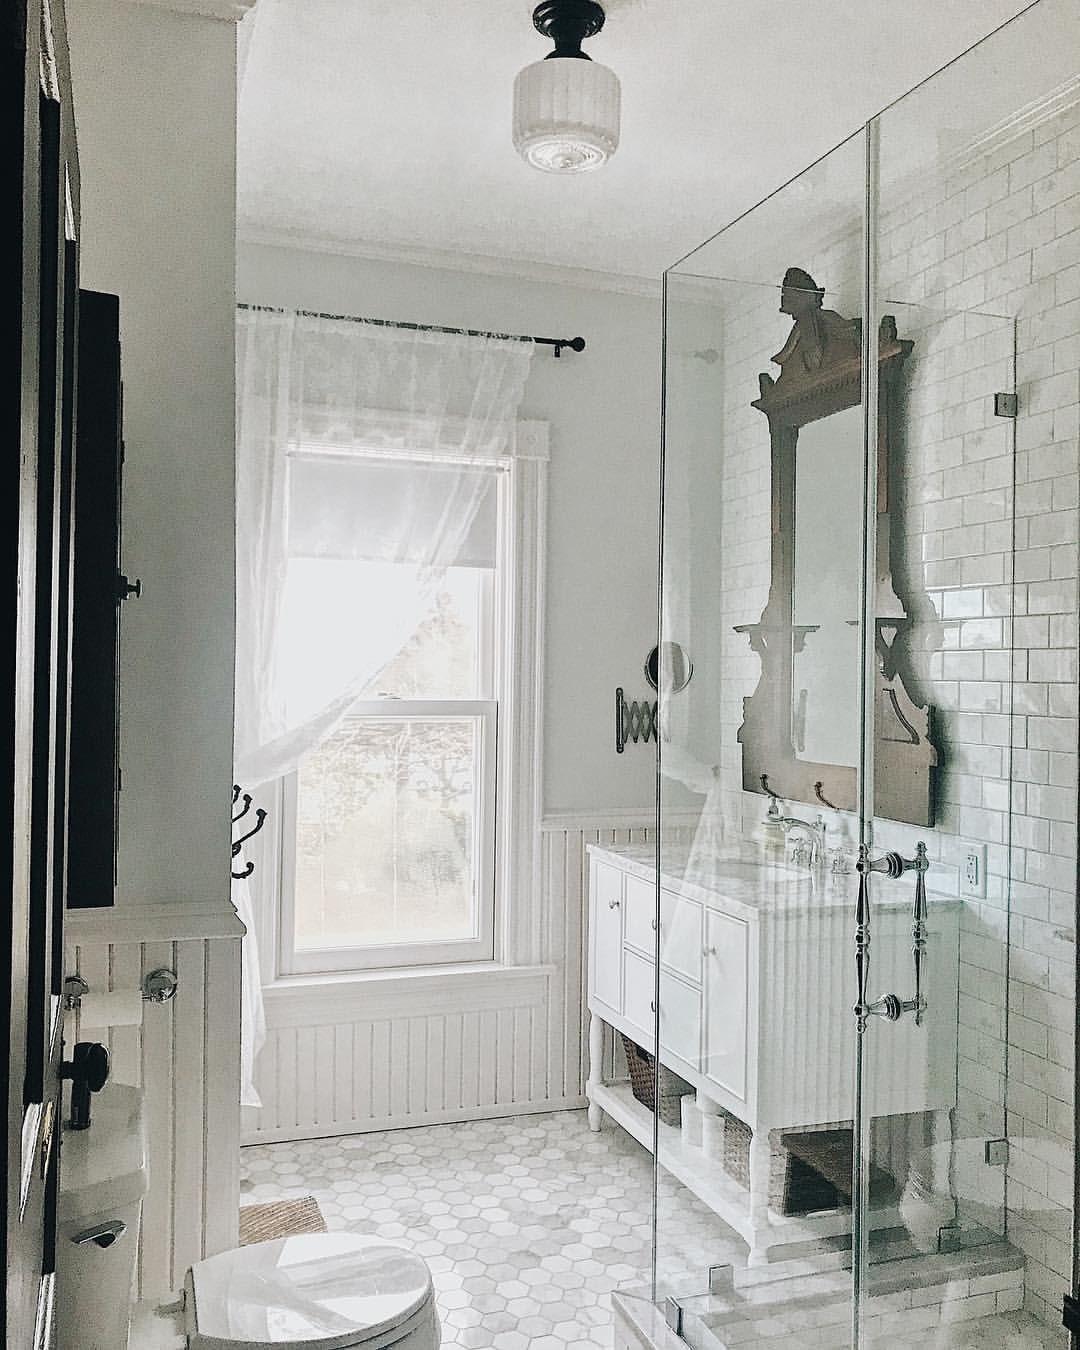 Pin By Mariaesteban On Decor Blissful Baths Beautiful Bathroom Decor Fun Bathroom Decor Home Decor